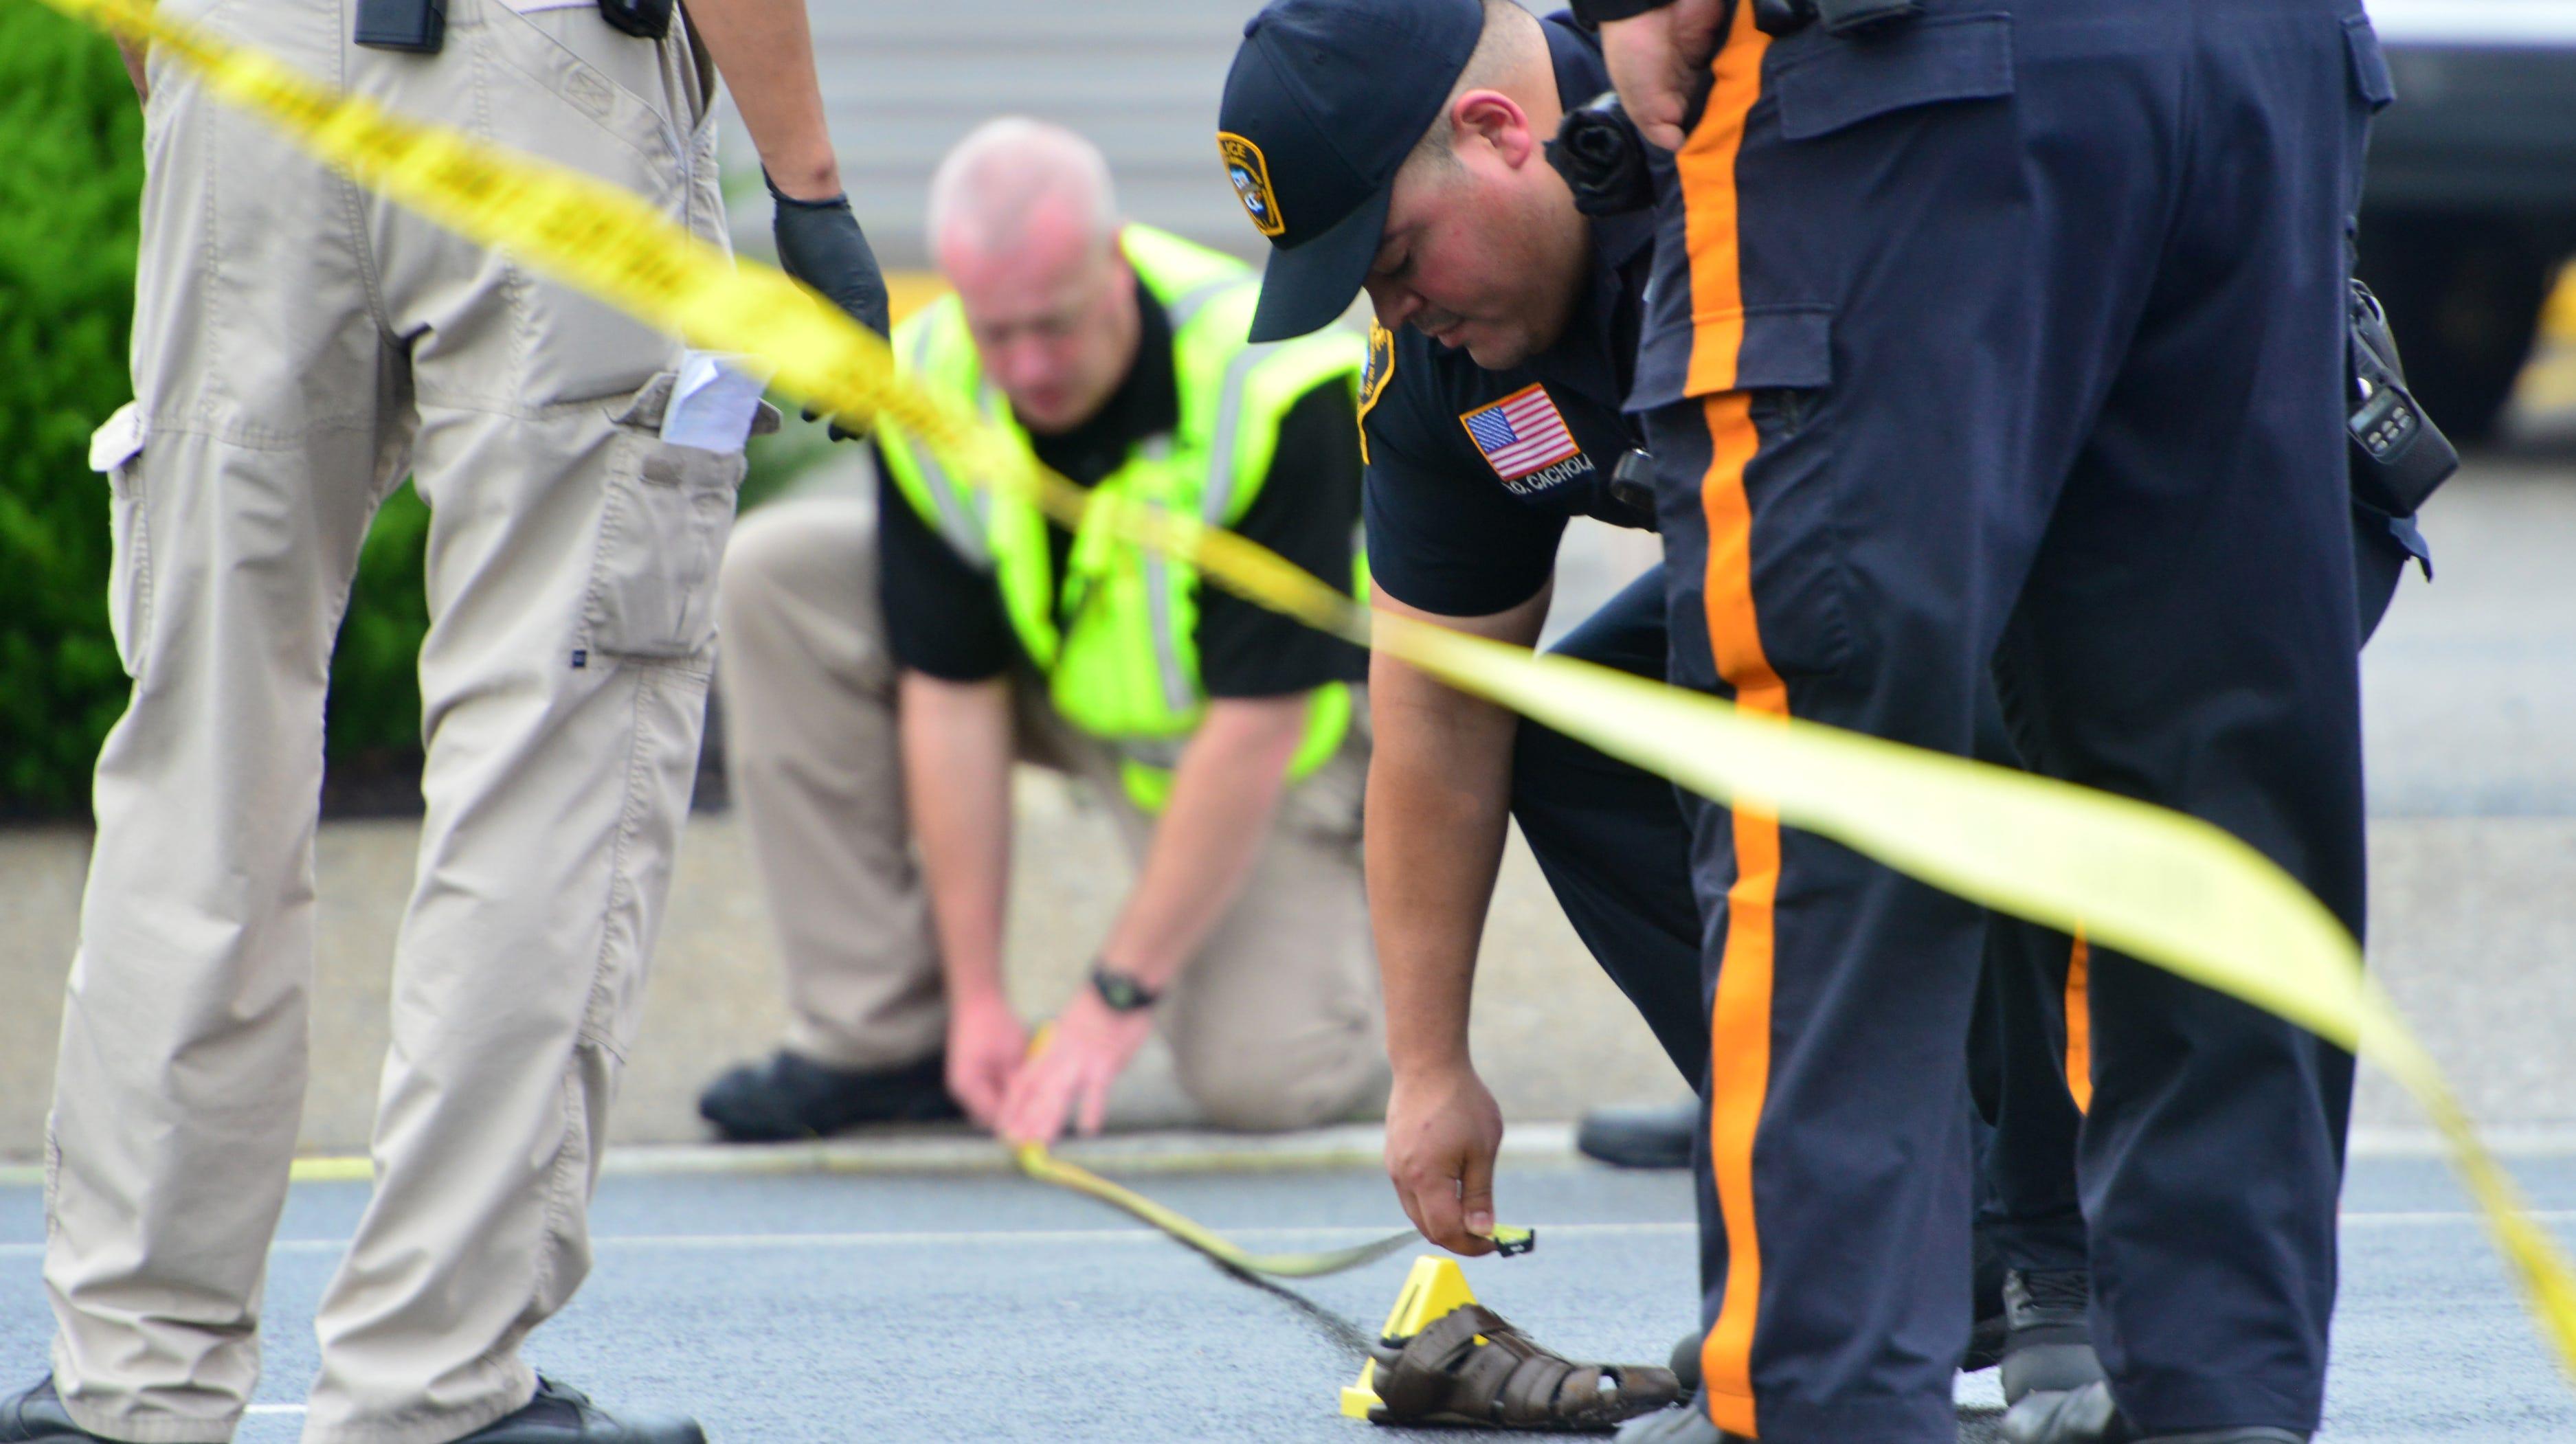 Elmwood Park pedestrian fatality follows a deadly NJ trend